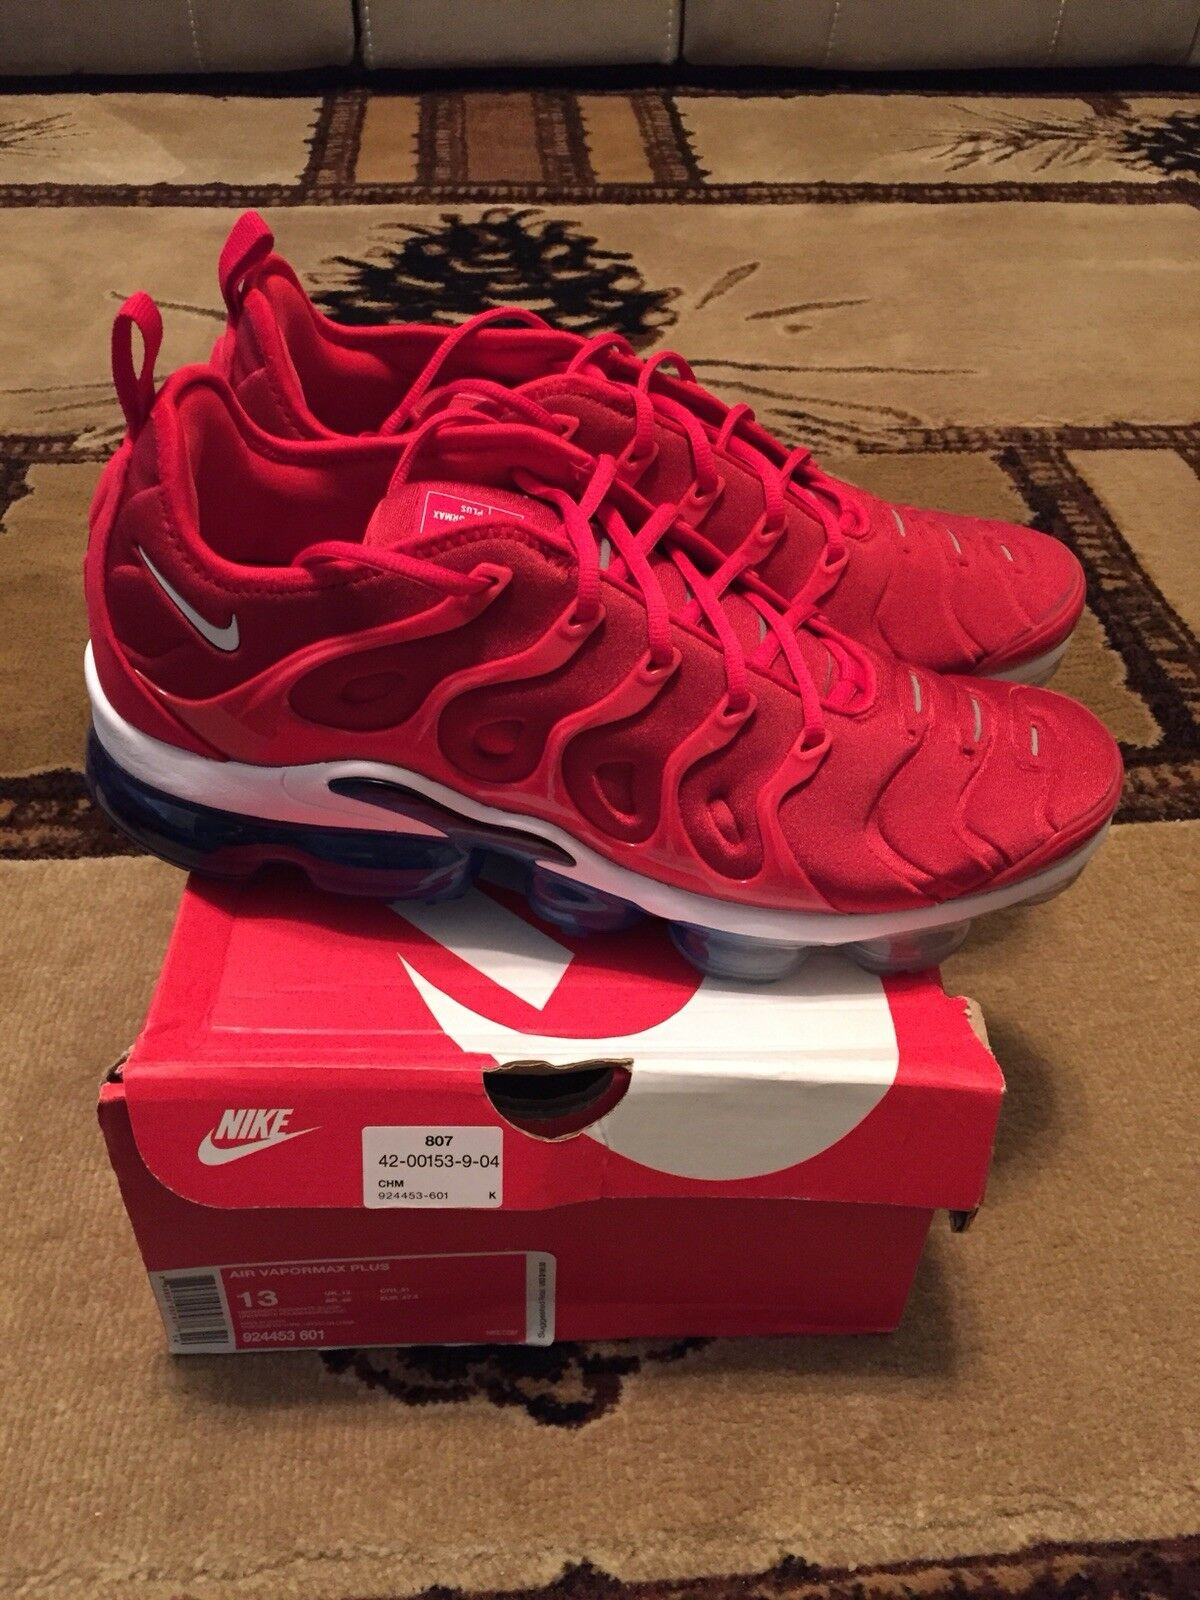 New 2018 Nike Air Vapormax Plus USA University Red White Blue B 924453-601 Sz 13 Wild casual shoes